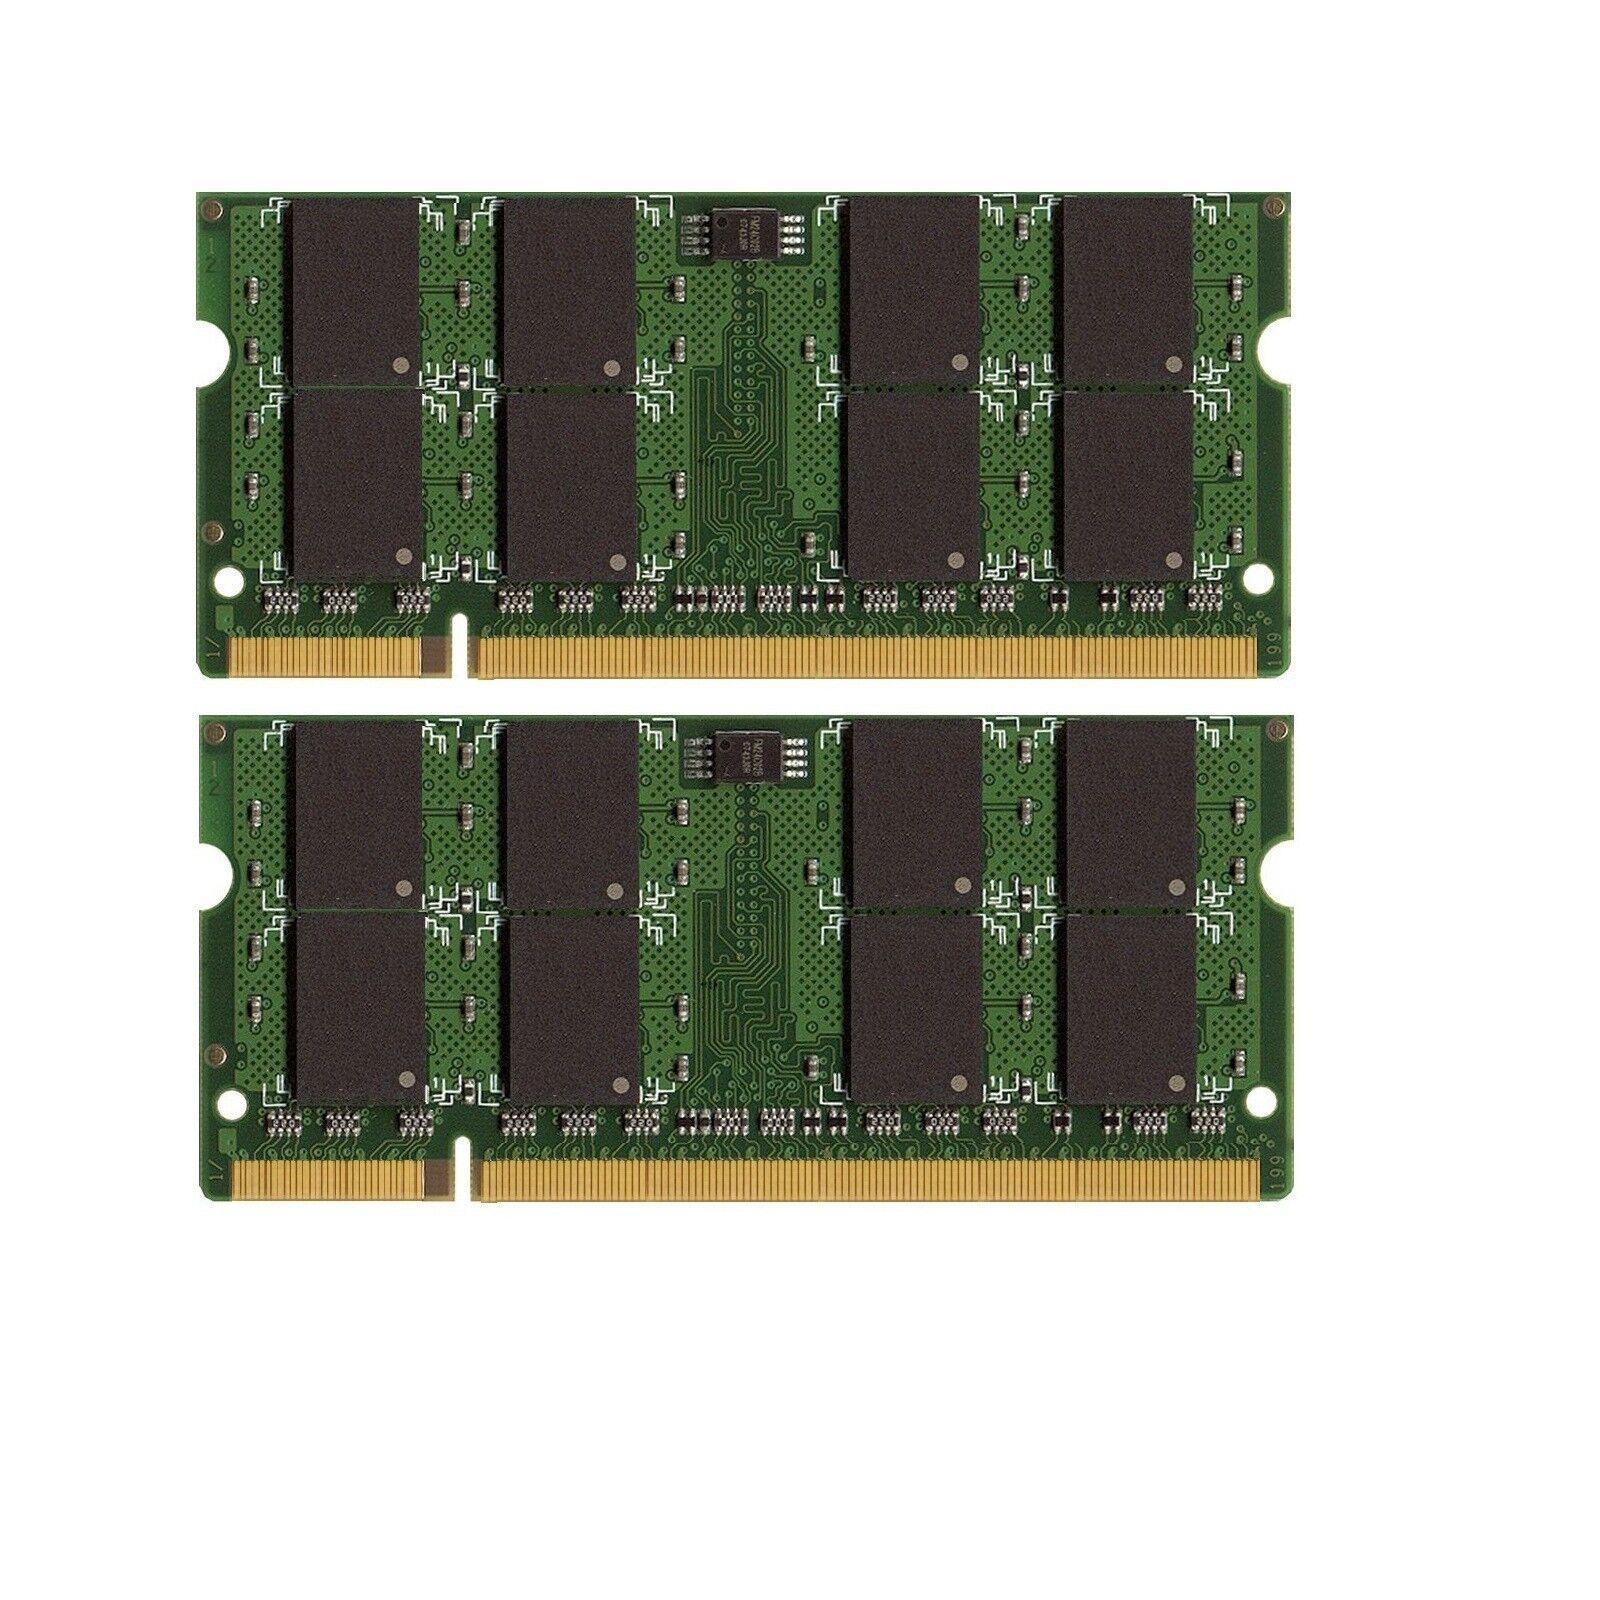 8GB 2x4GB Memory PC3-10600 SODIMM For HP PROBOOK 6440B